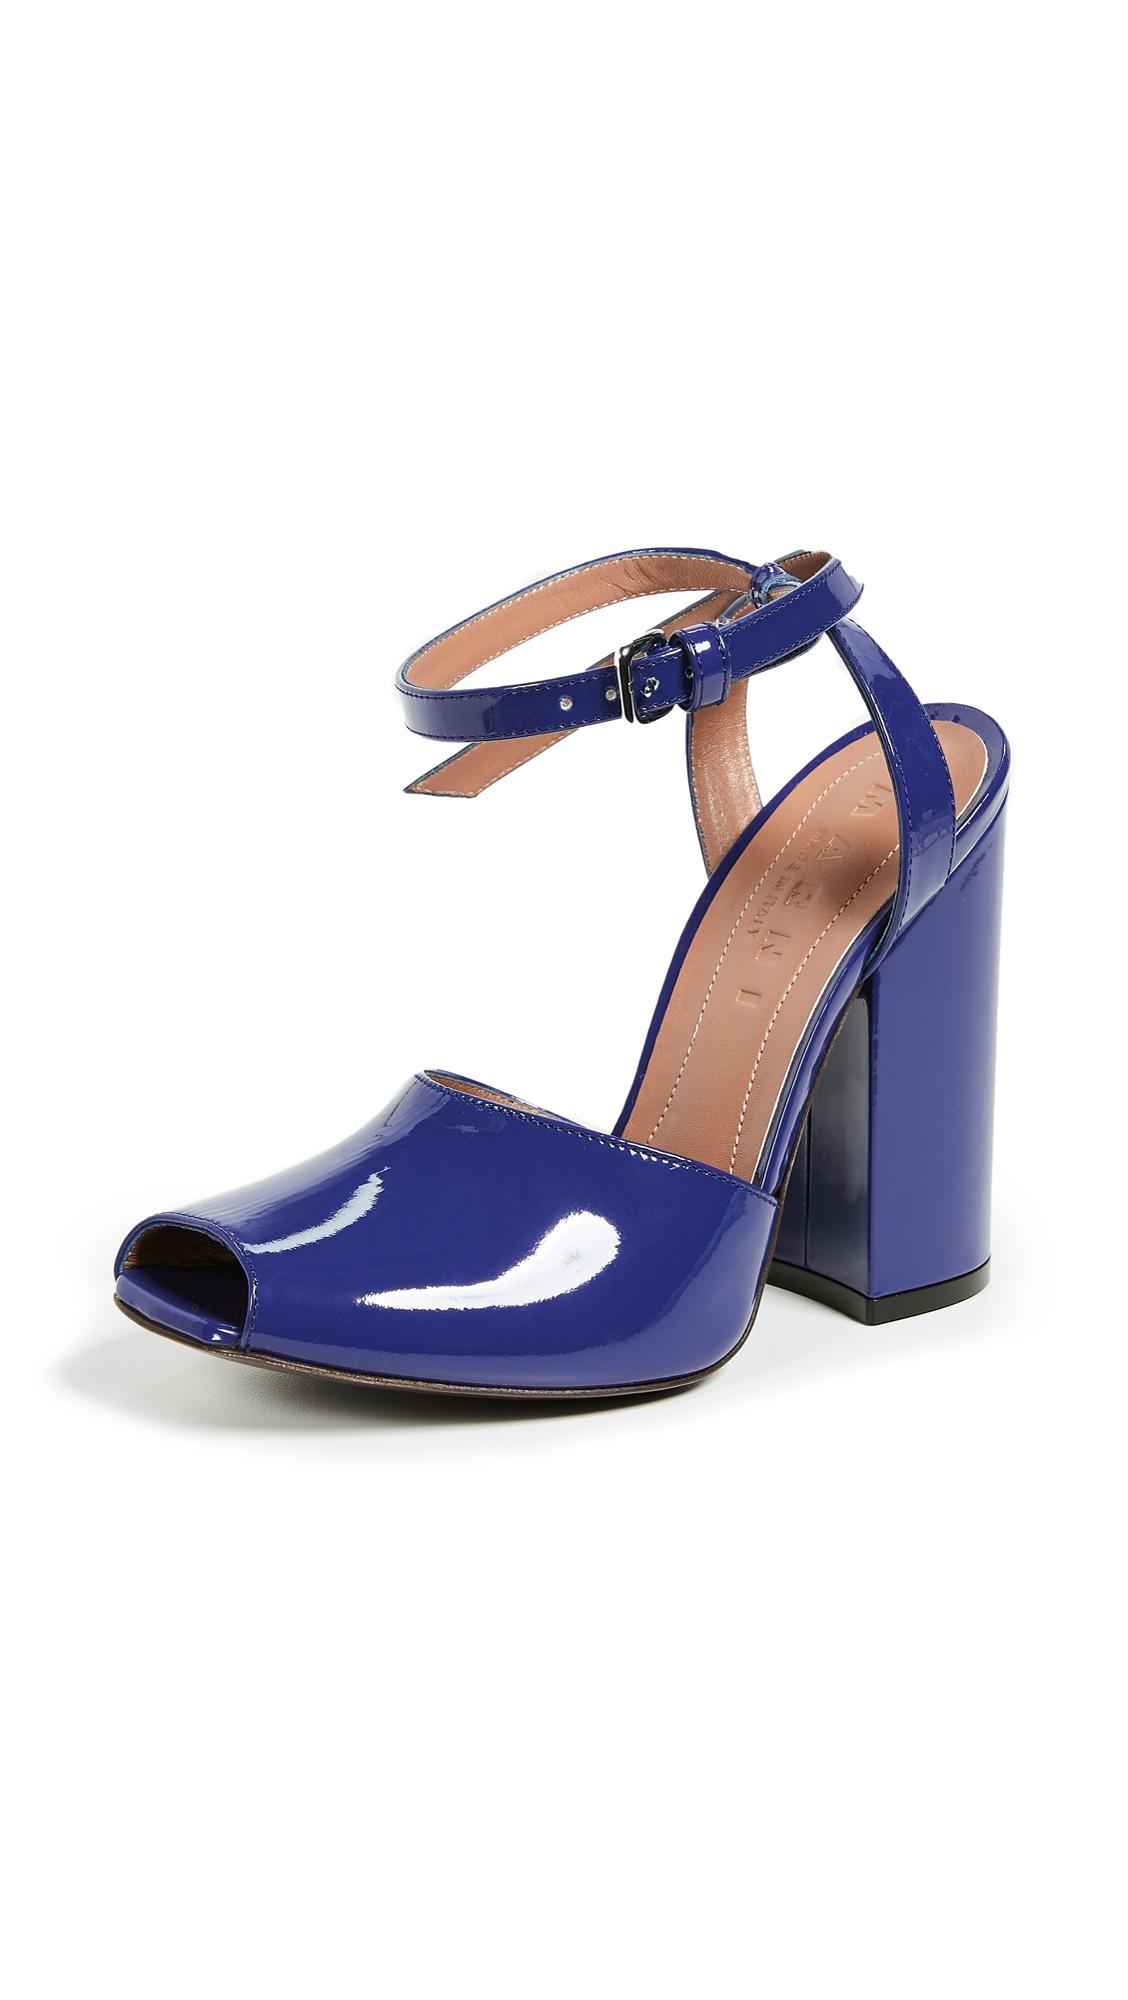 Marni Ankle Strap Sandal Pumps - India Ink